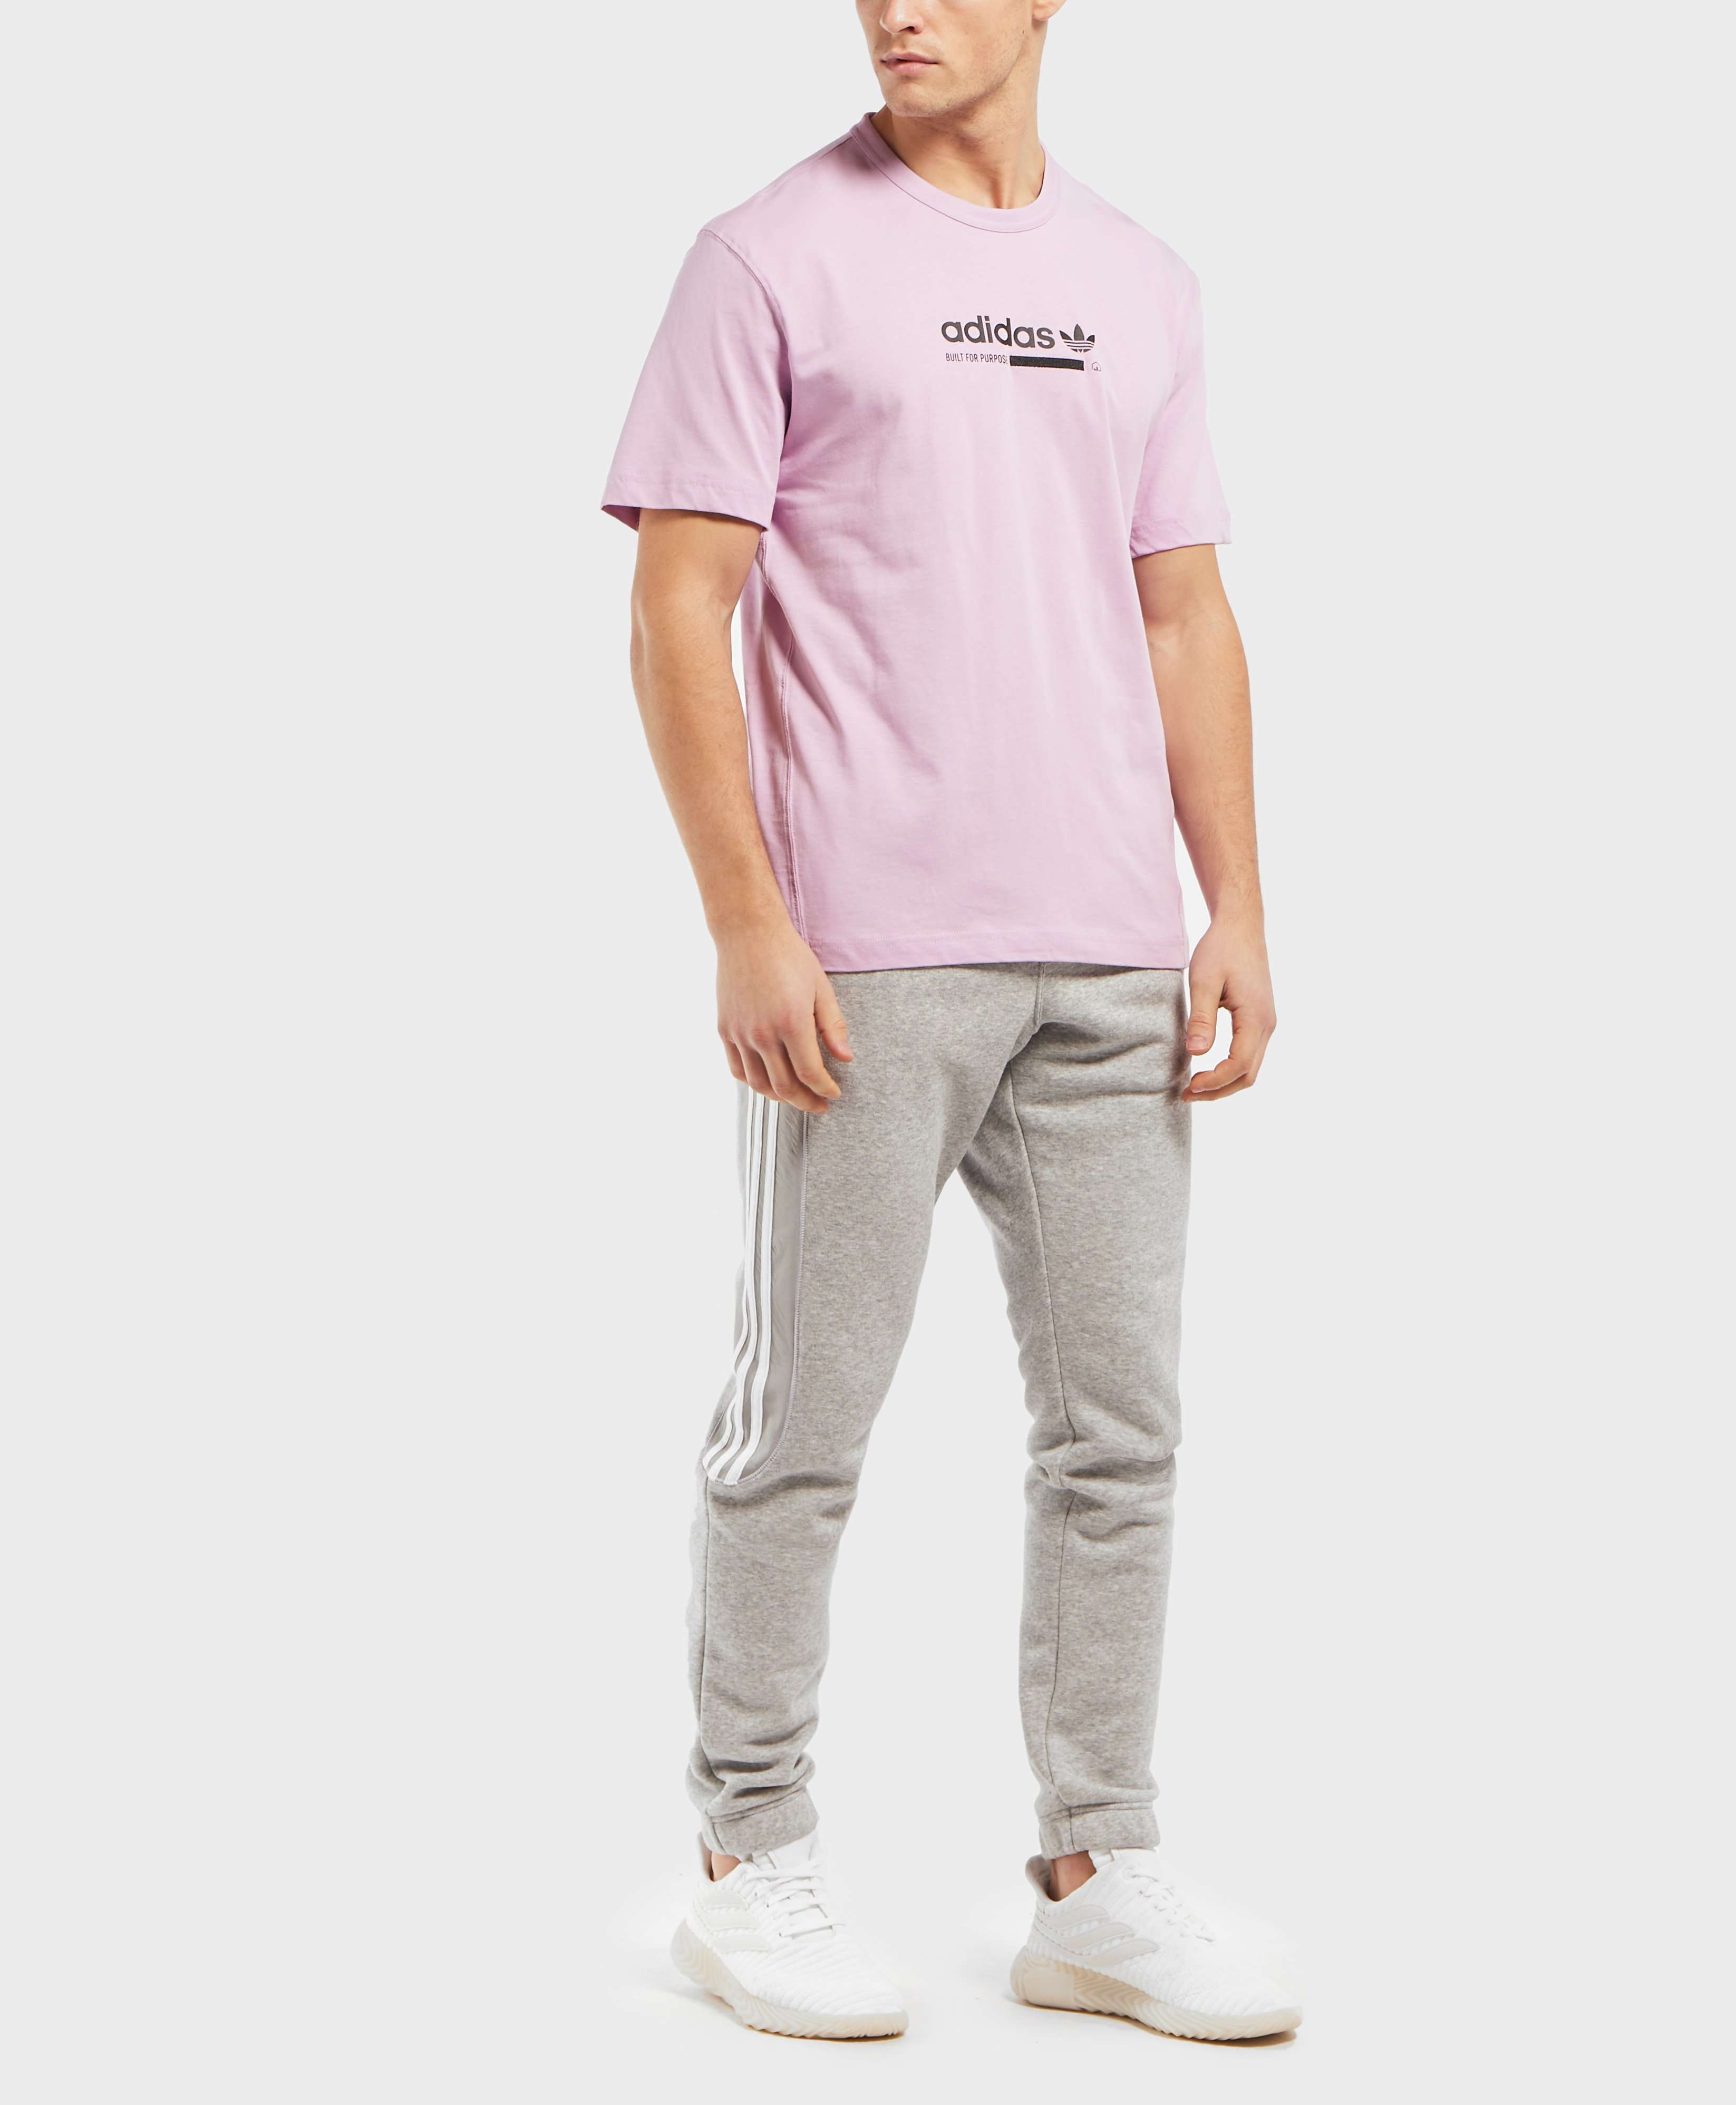 adidas Originals Kaval Short Sleeve T-Shirt